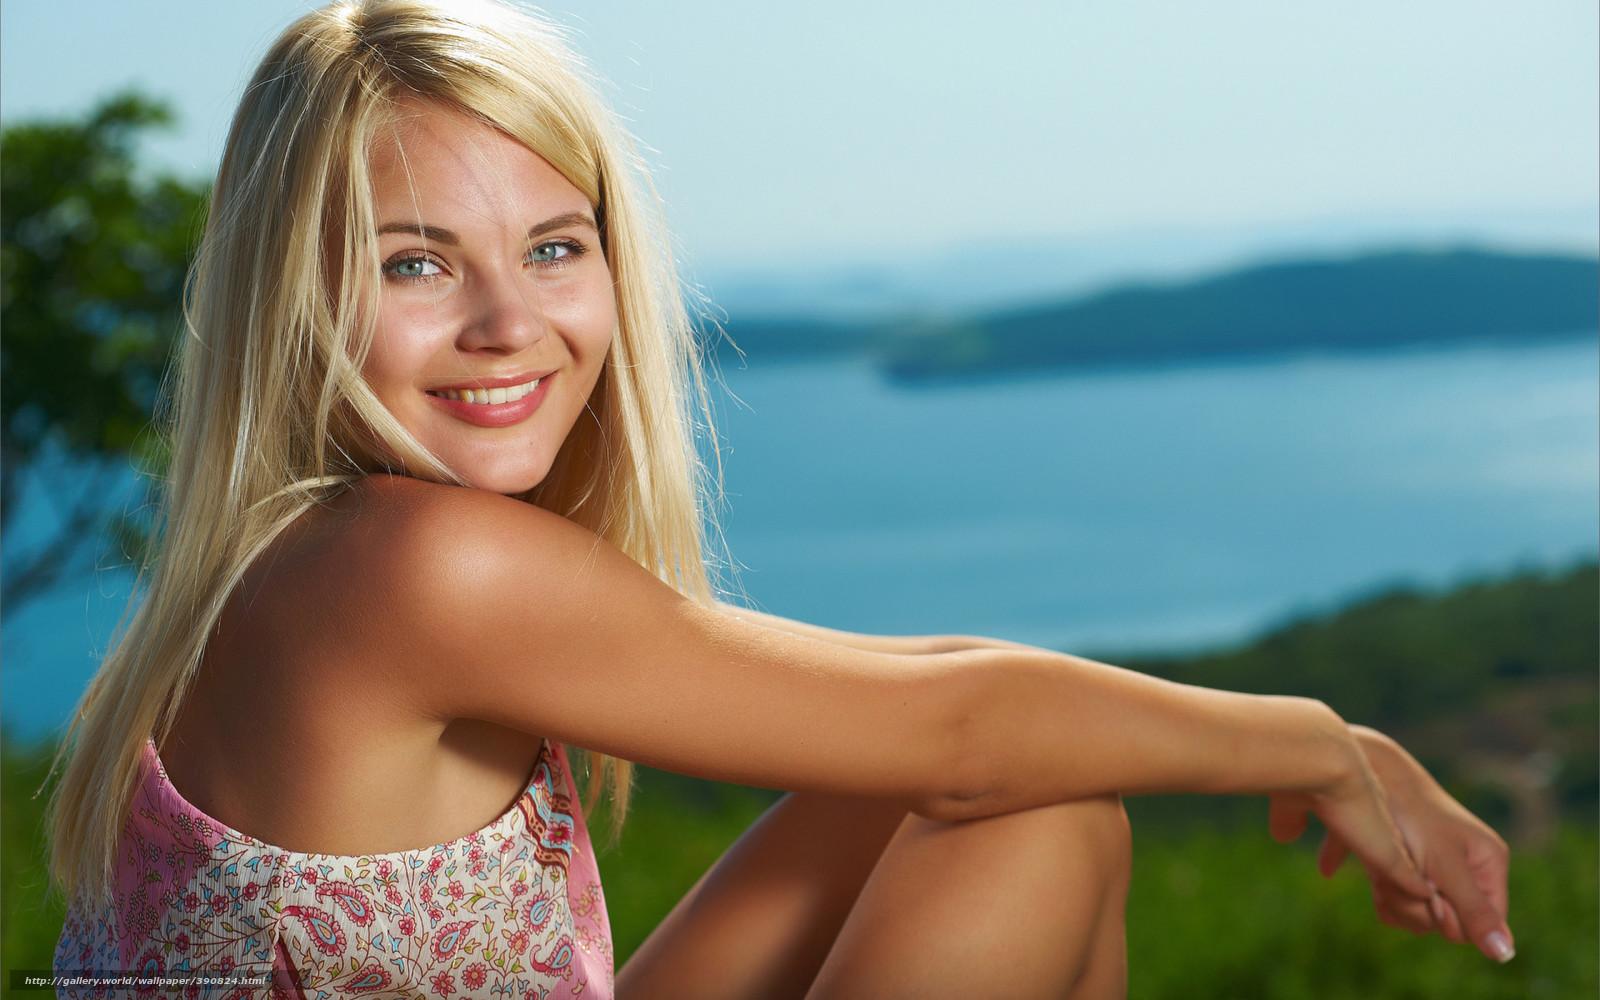 Симпатичная девочка фото 12 фотография